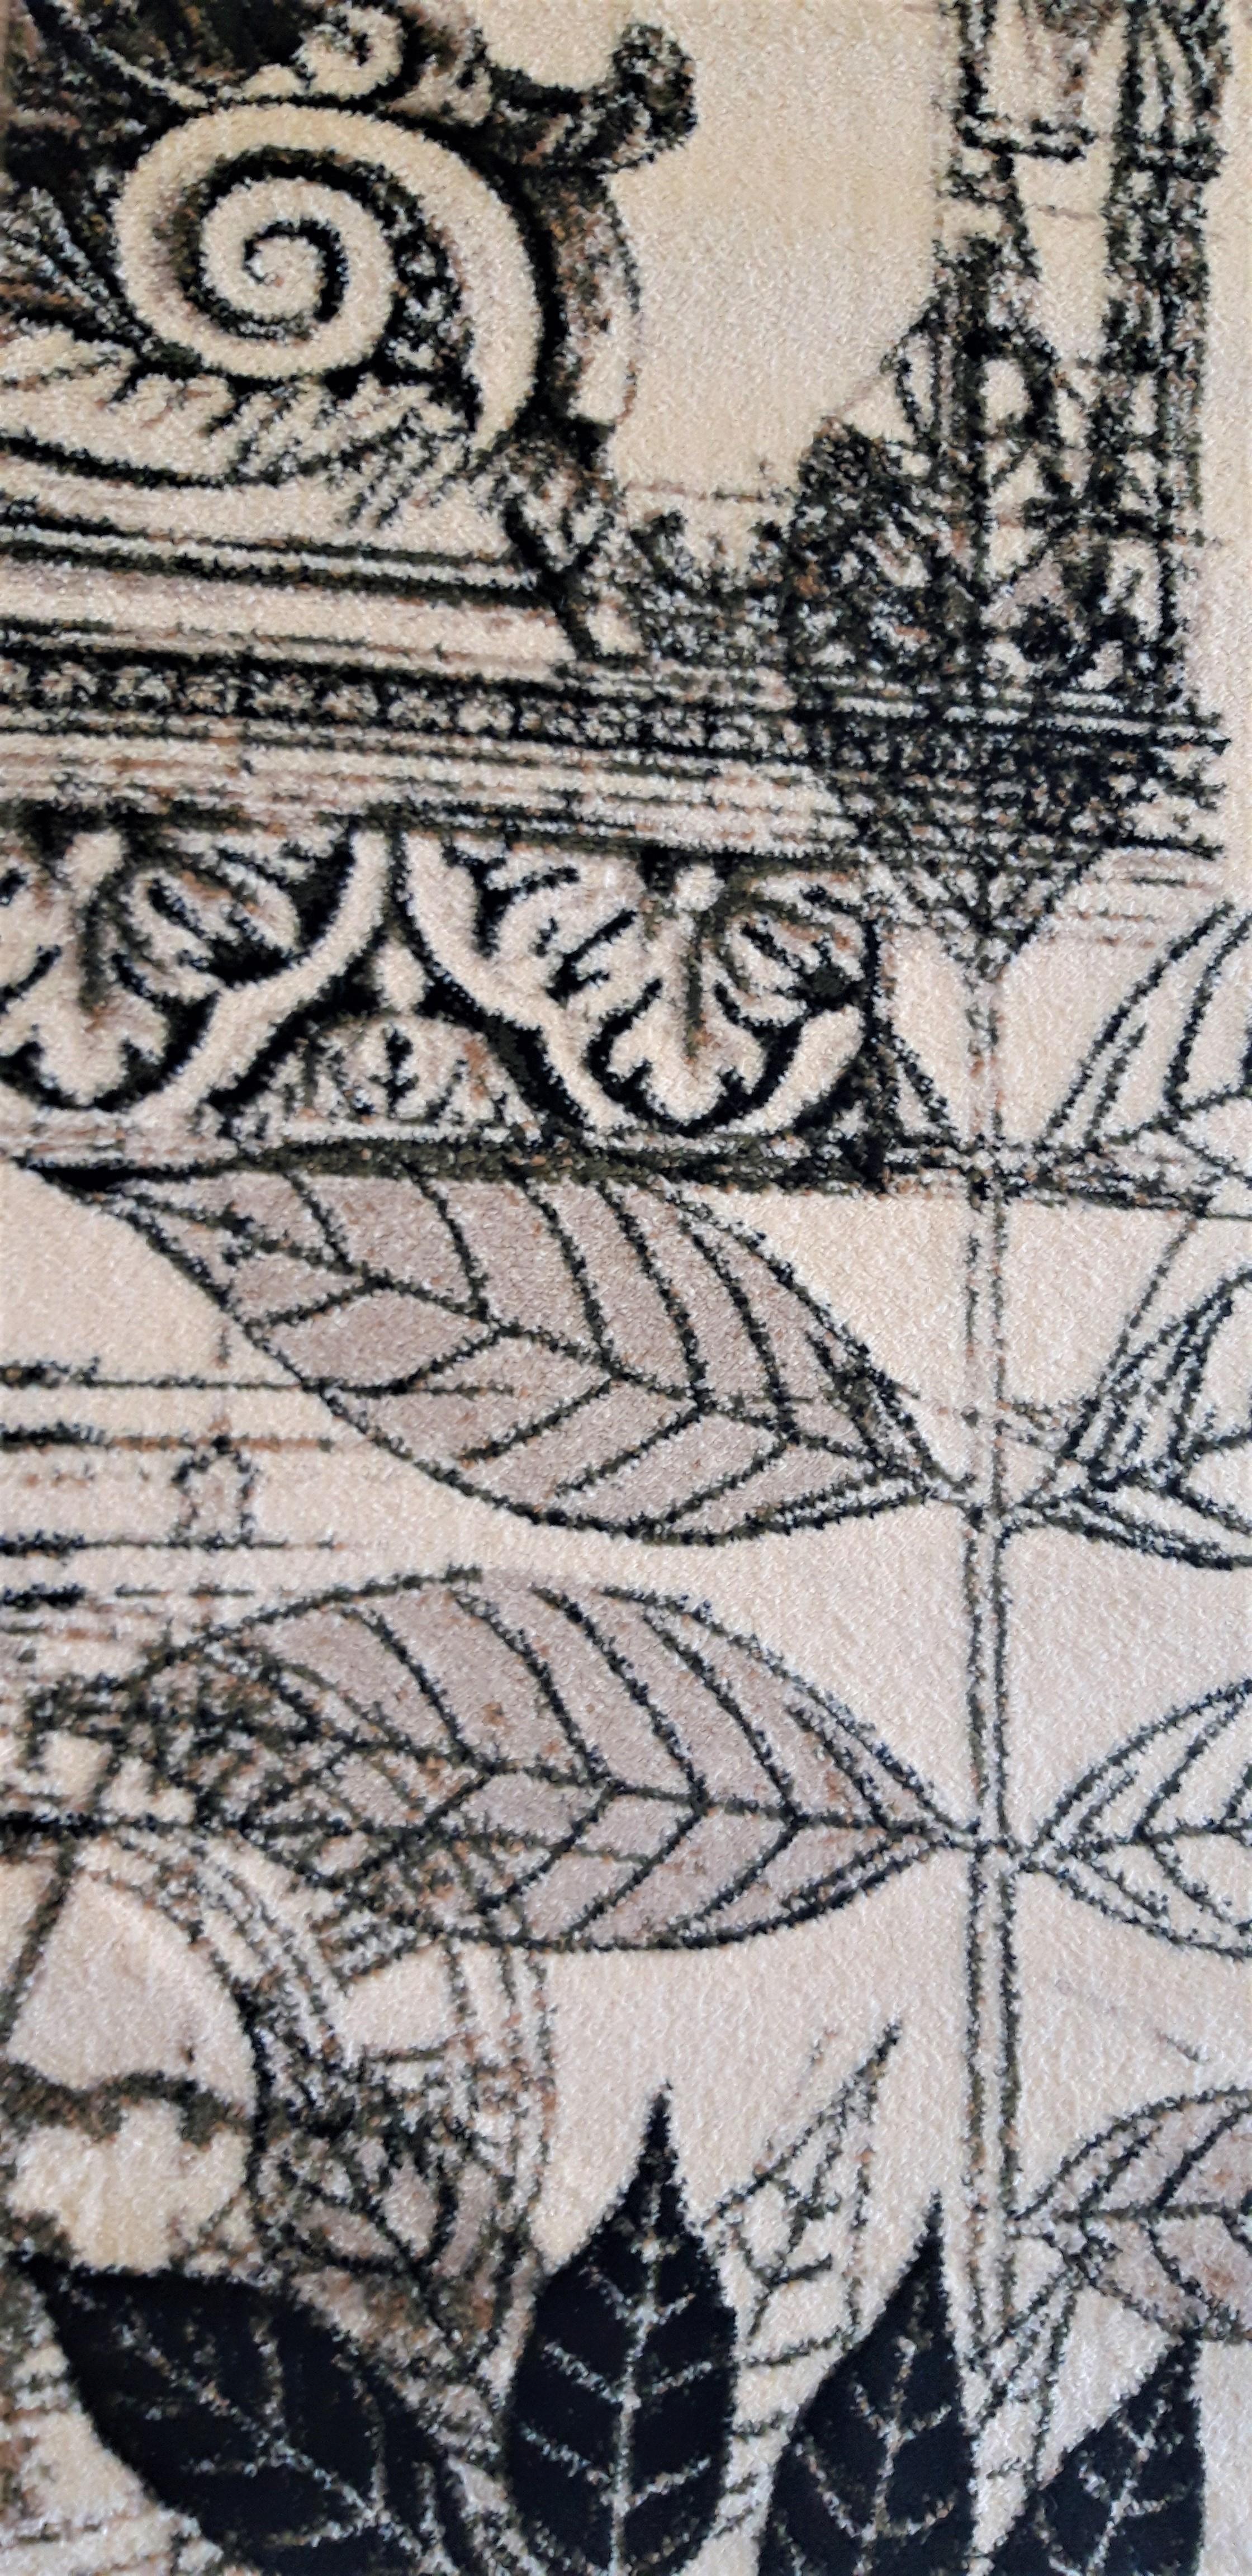 Covor Modern, Lotos Frunze 1545, Crem / Bej / Gri, Oval, 160x230 cm, 1800 gr/mp [5]